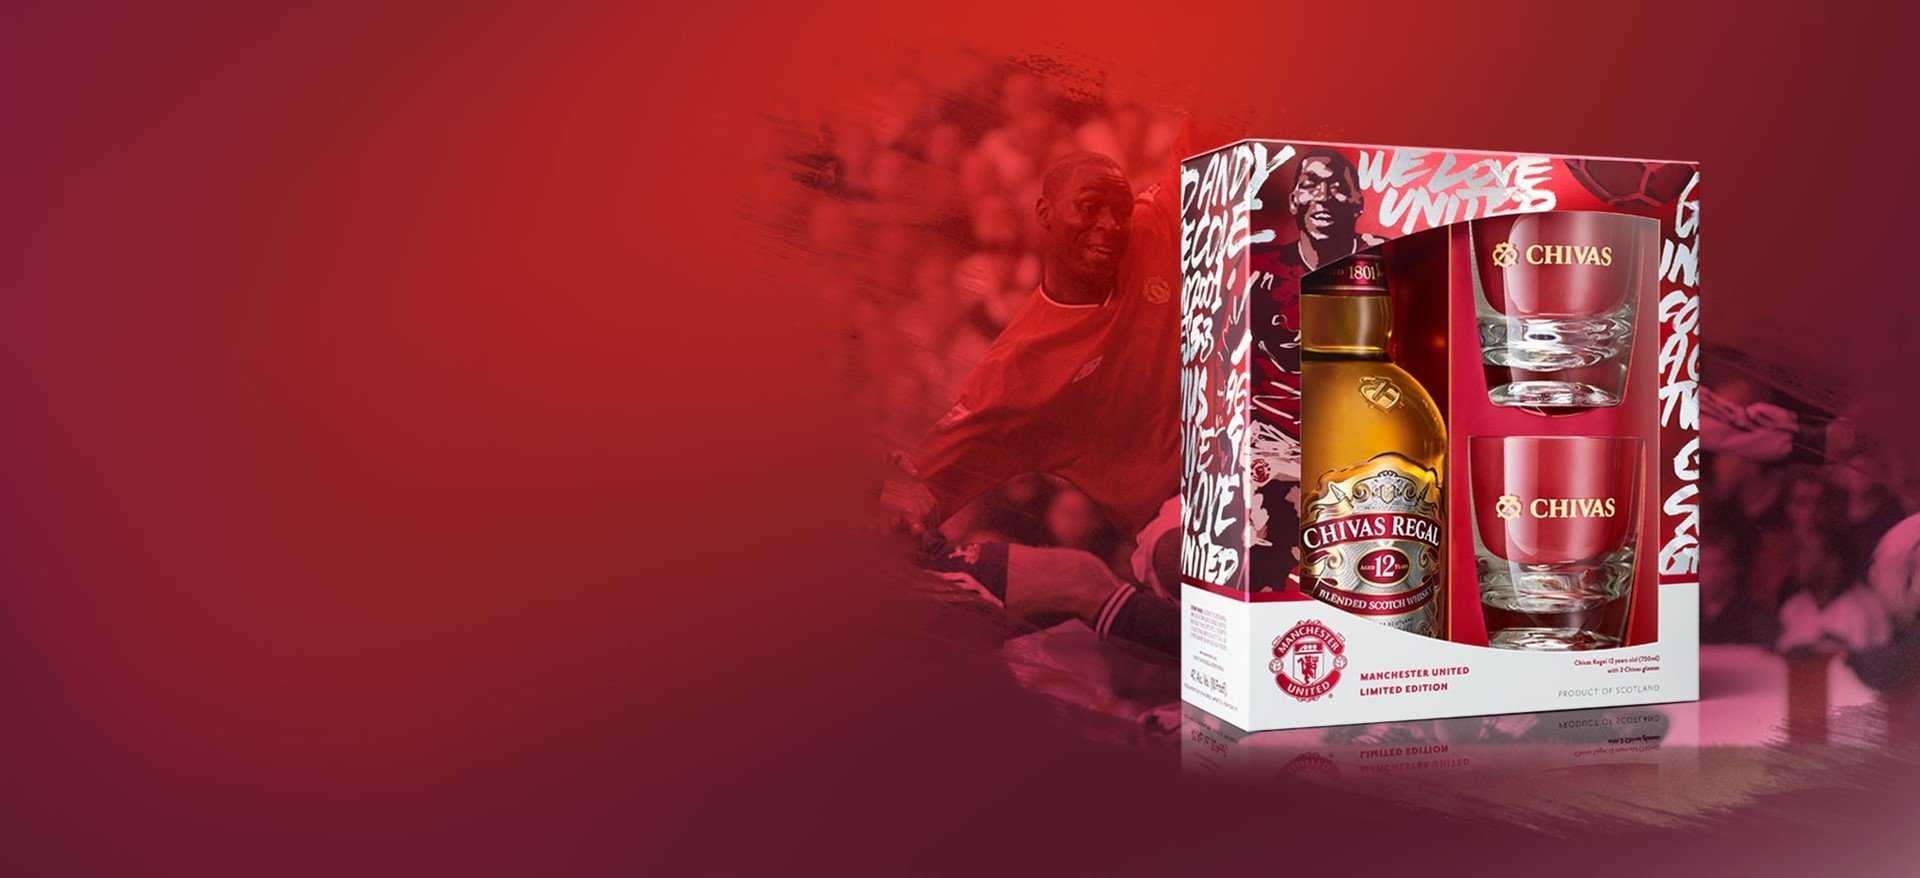 Chivas x Man Utd Limited Edition